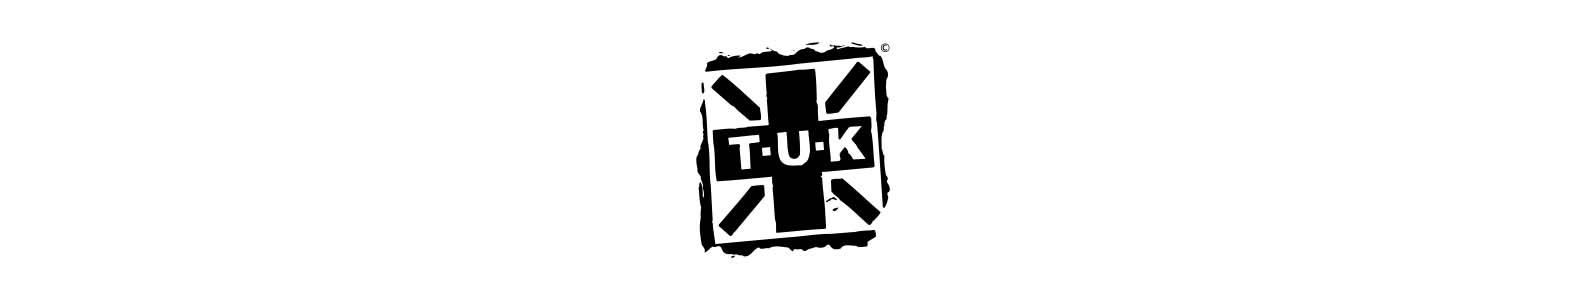 T.U.K. brand header image